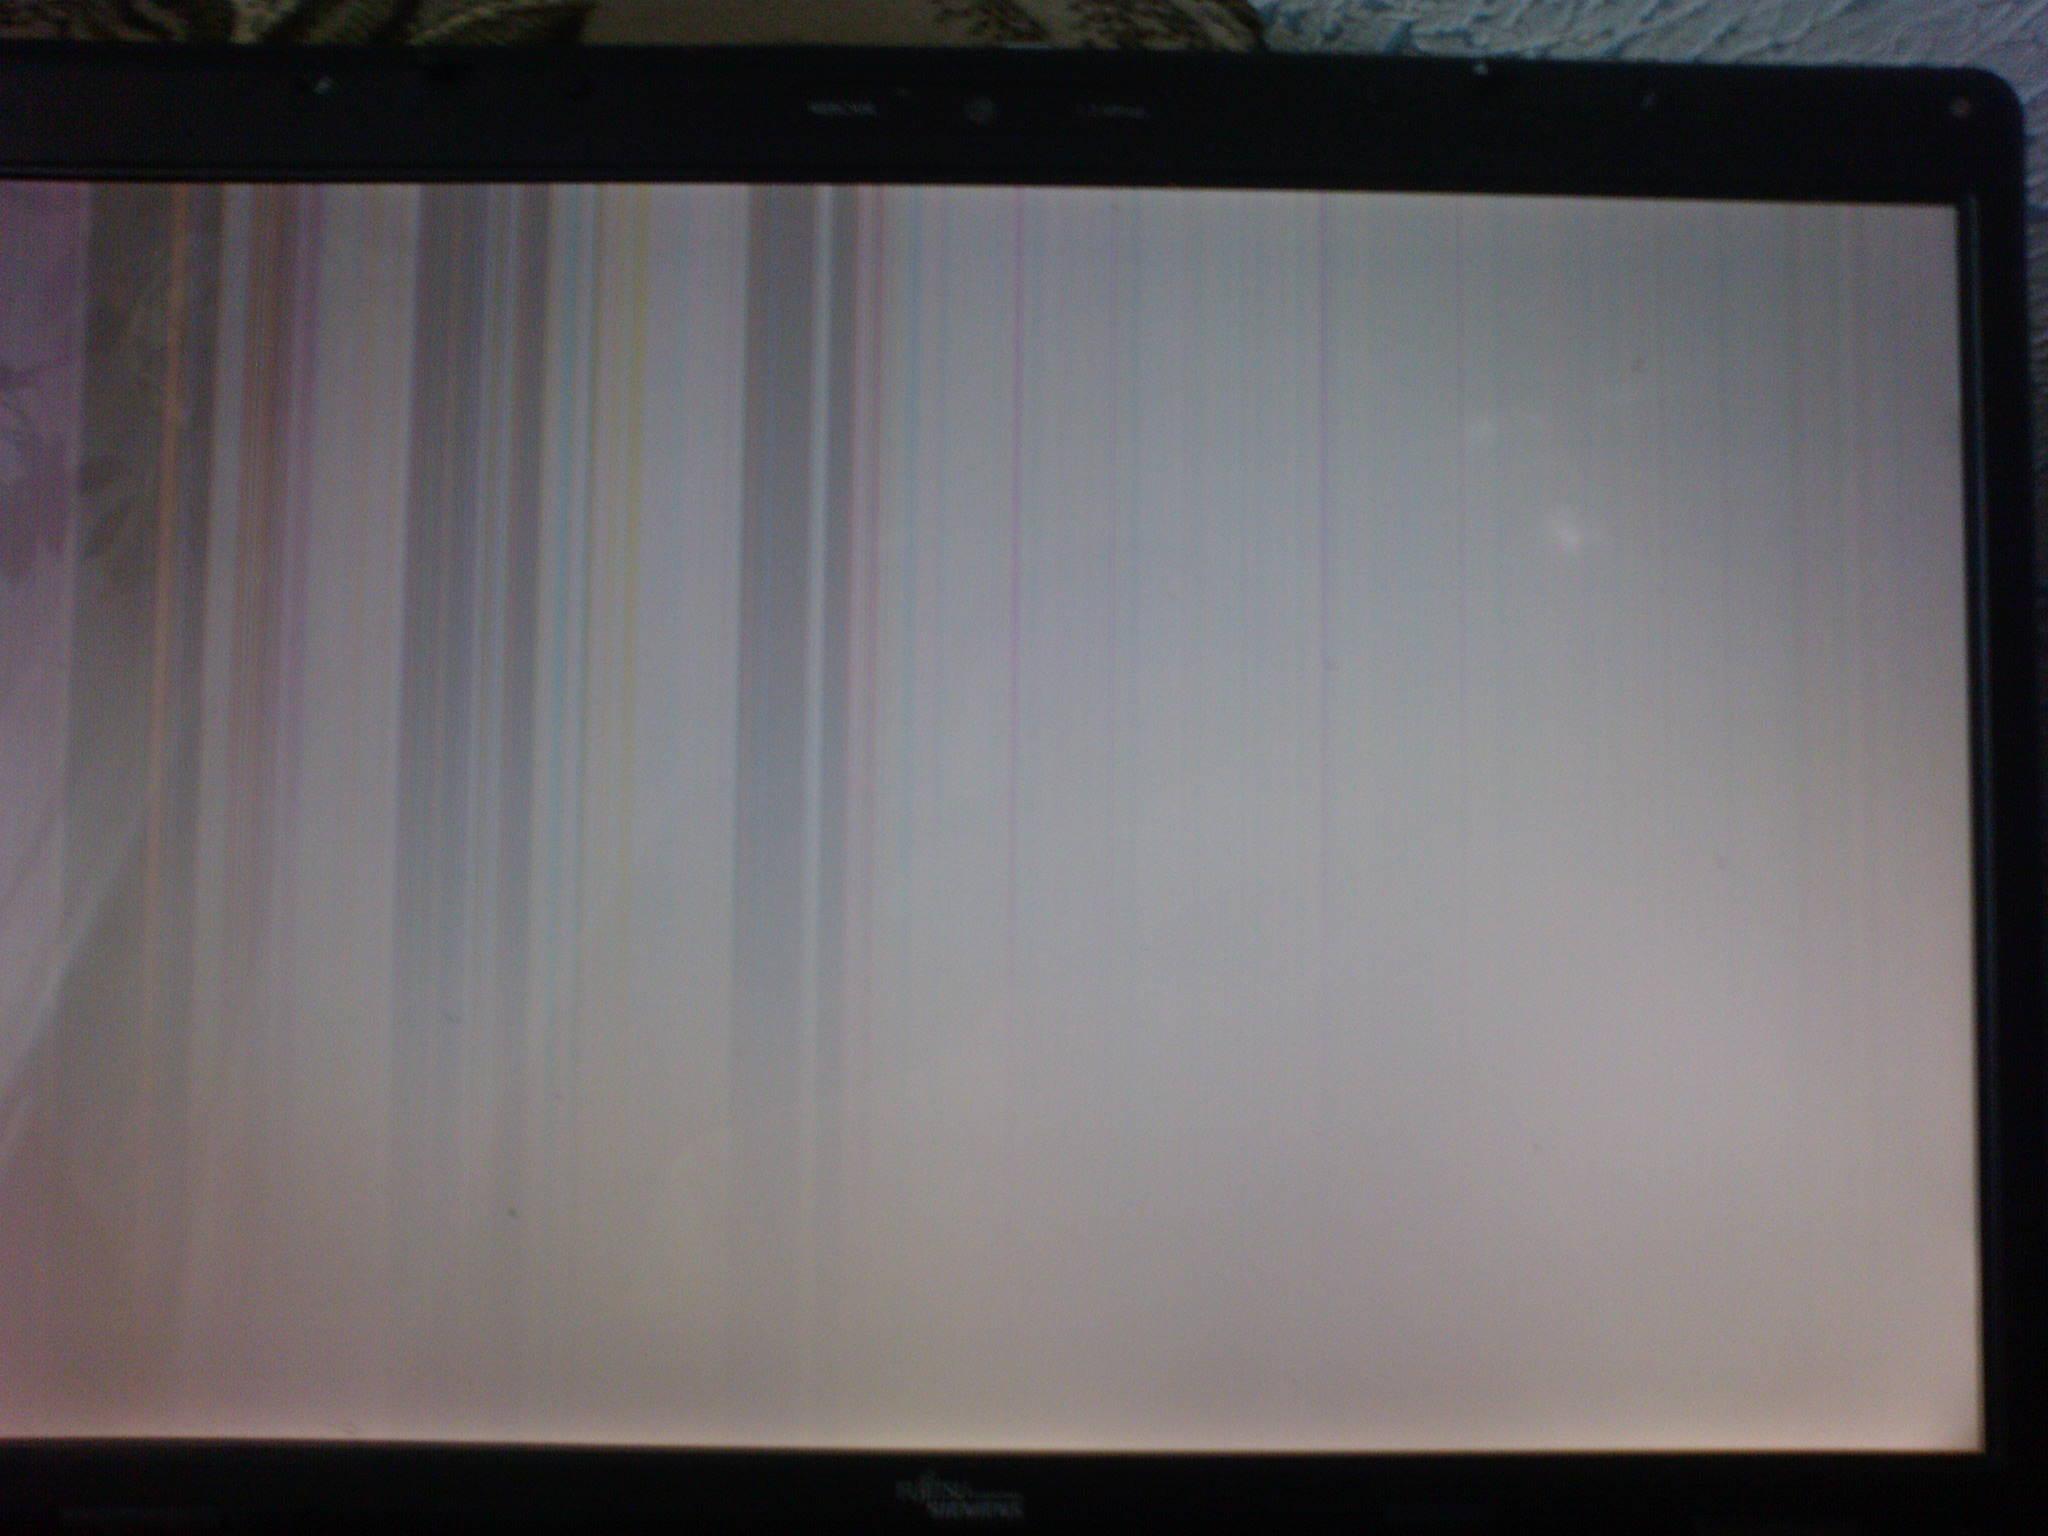 Fujitsu Simens Amilo Pa 2548 - Kolorowe pionowe paski na ekranie laptopa